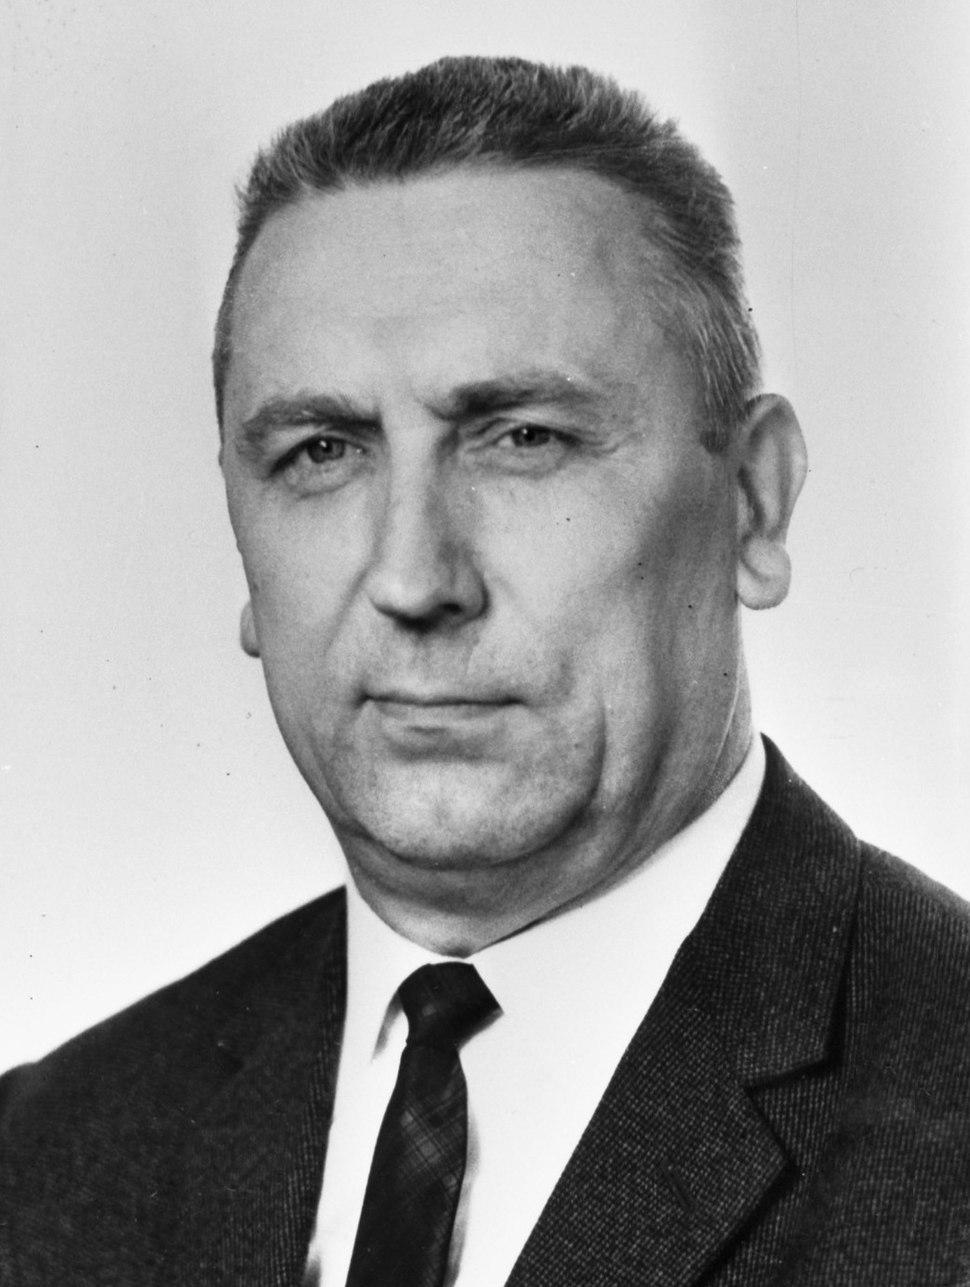 Edward Gierek 1980